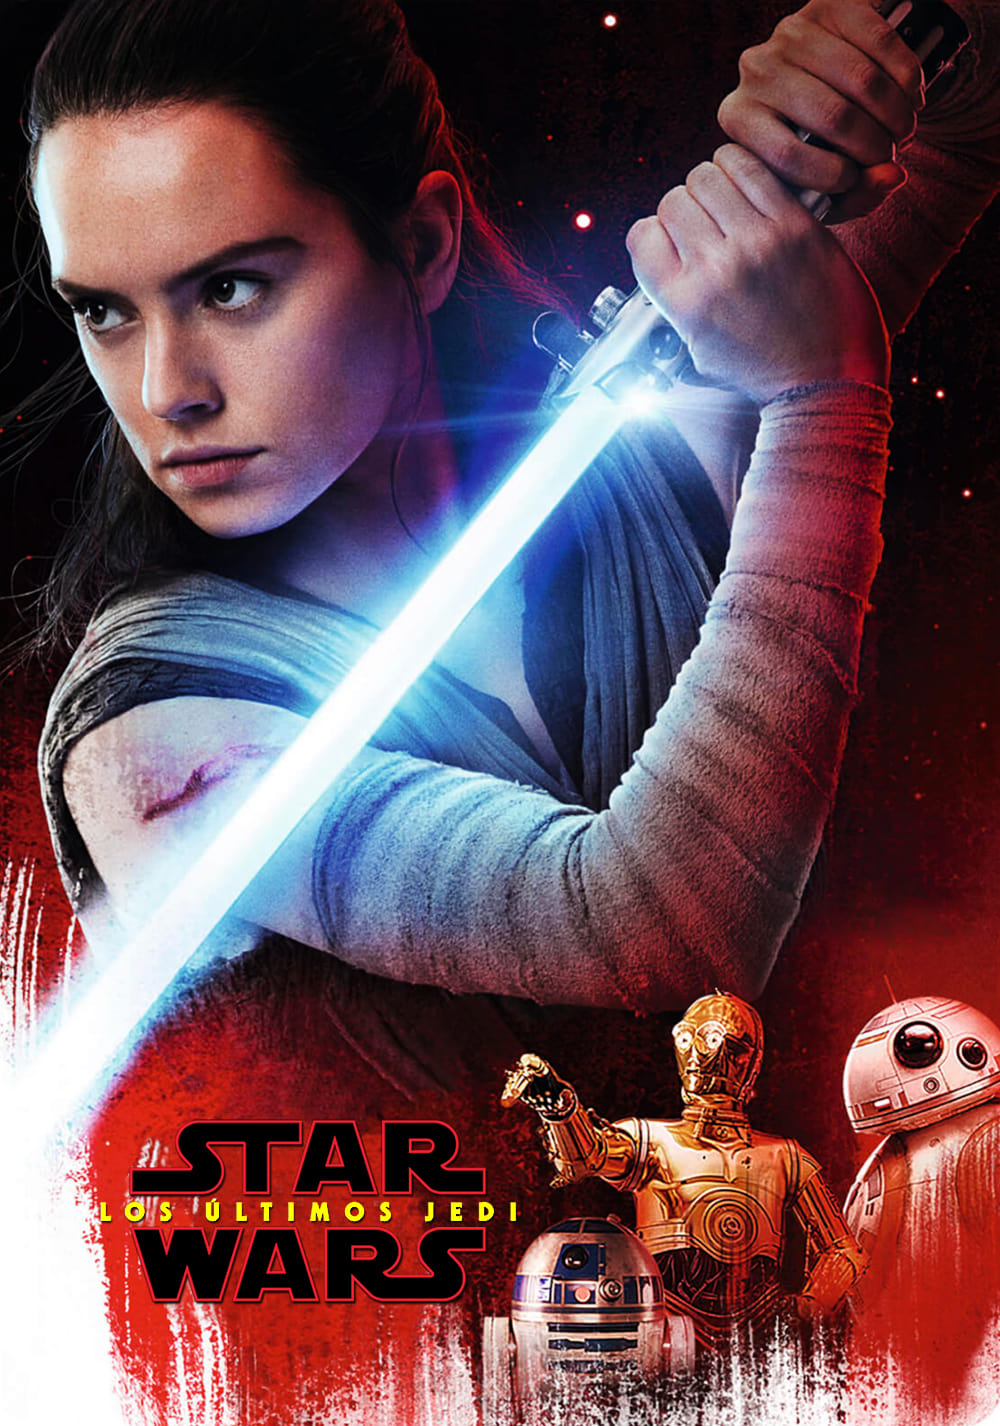 Star Wars Episodio 8 - Los Ultimos Jedi (2017) LATINO